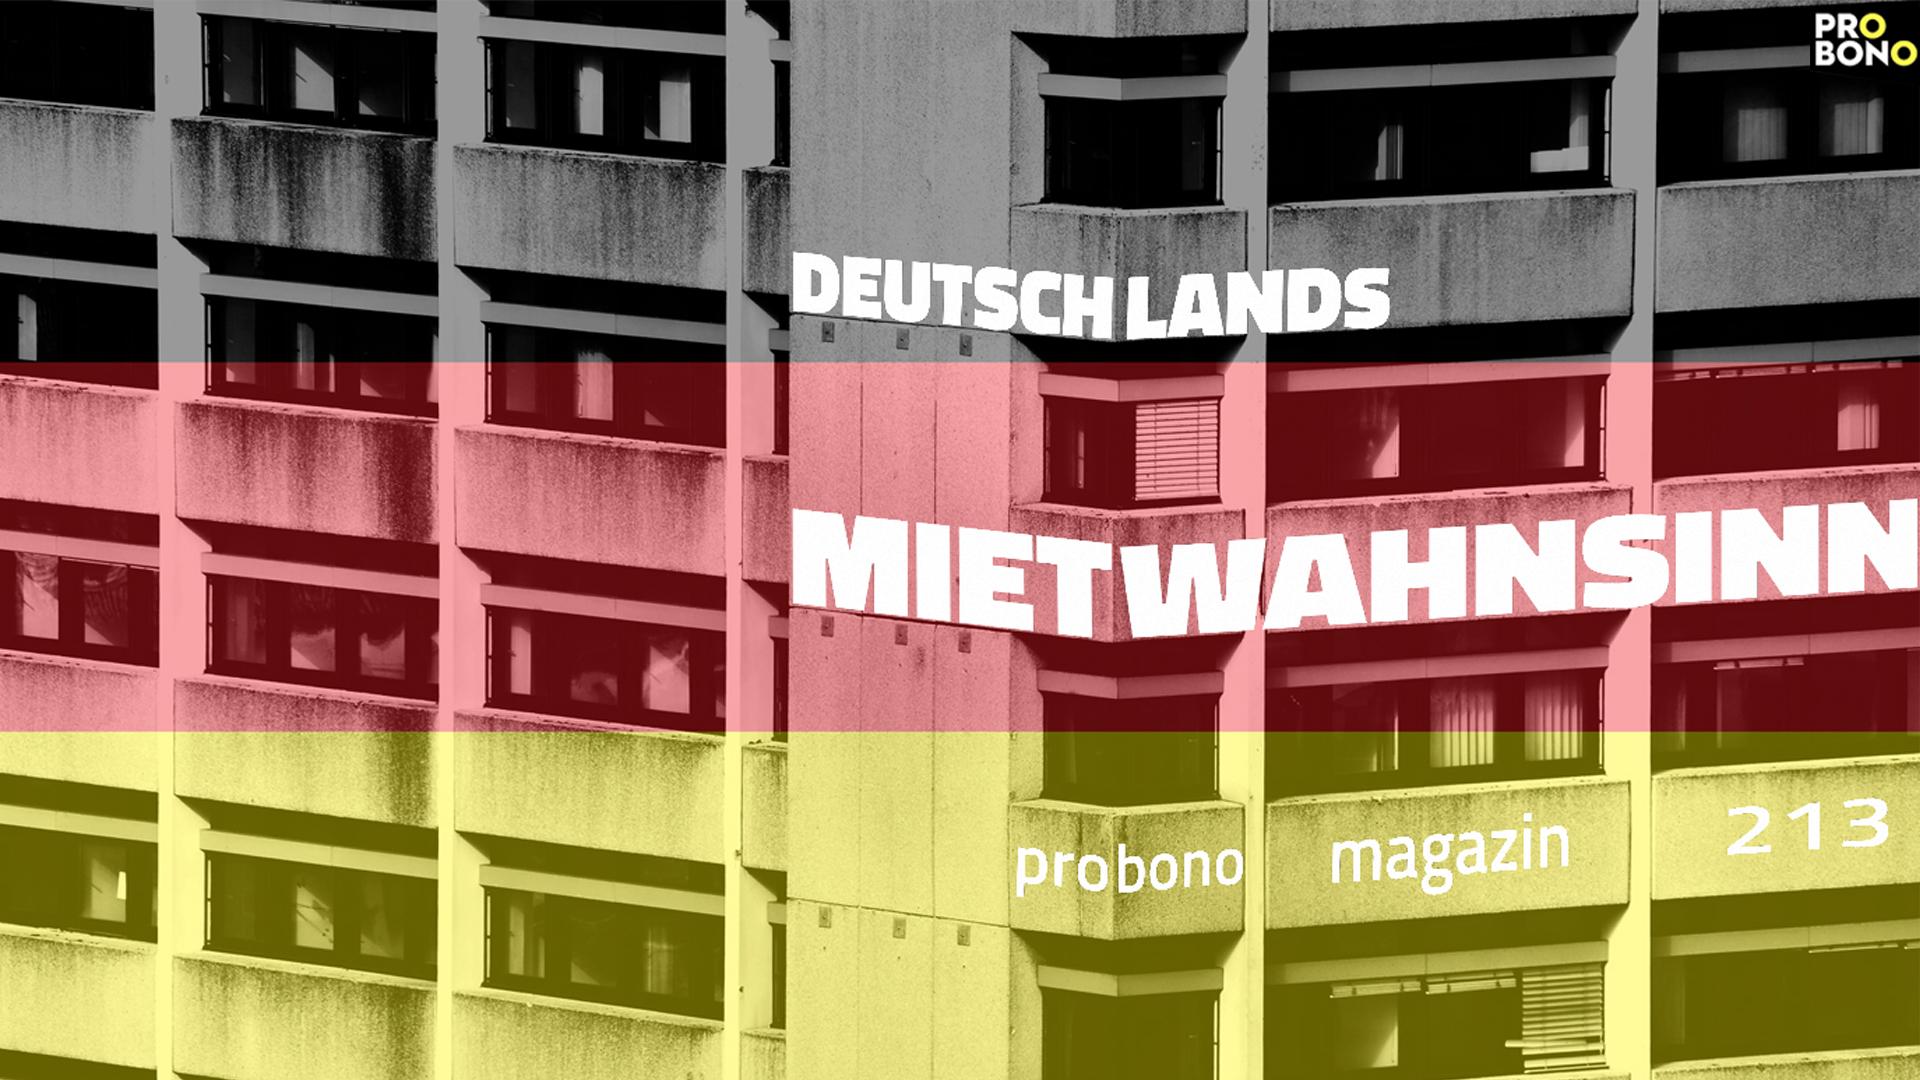 Selbstbestimmt Wohnen: Tschüss Mietpreiswahnsinn! (probono Magazin)